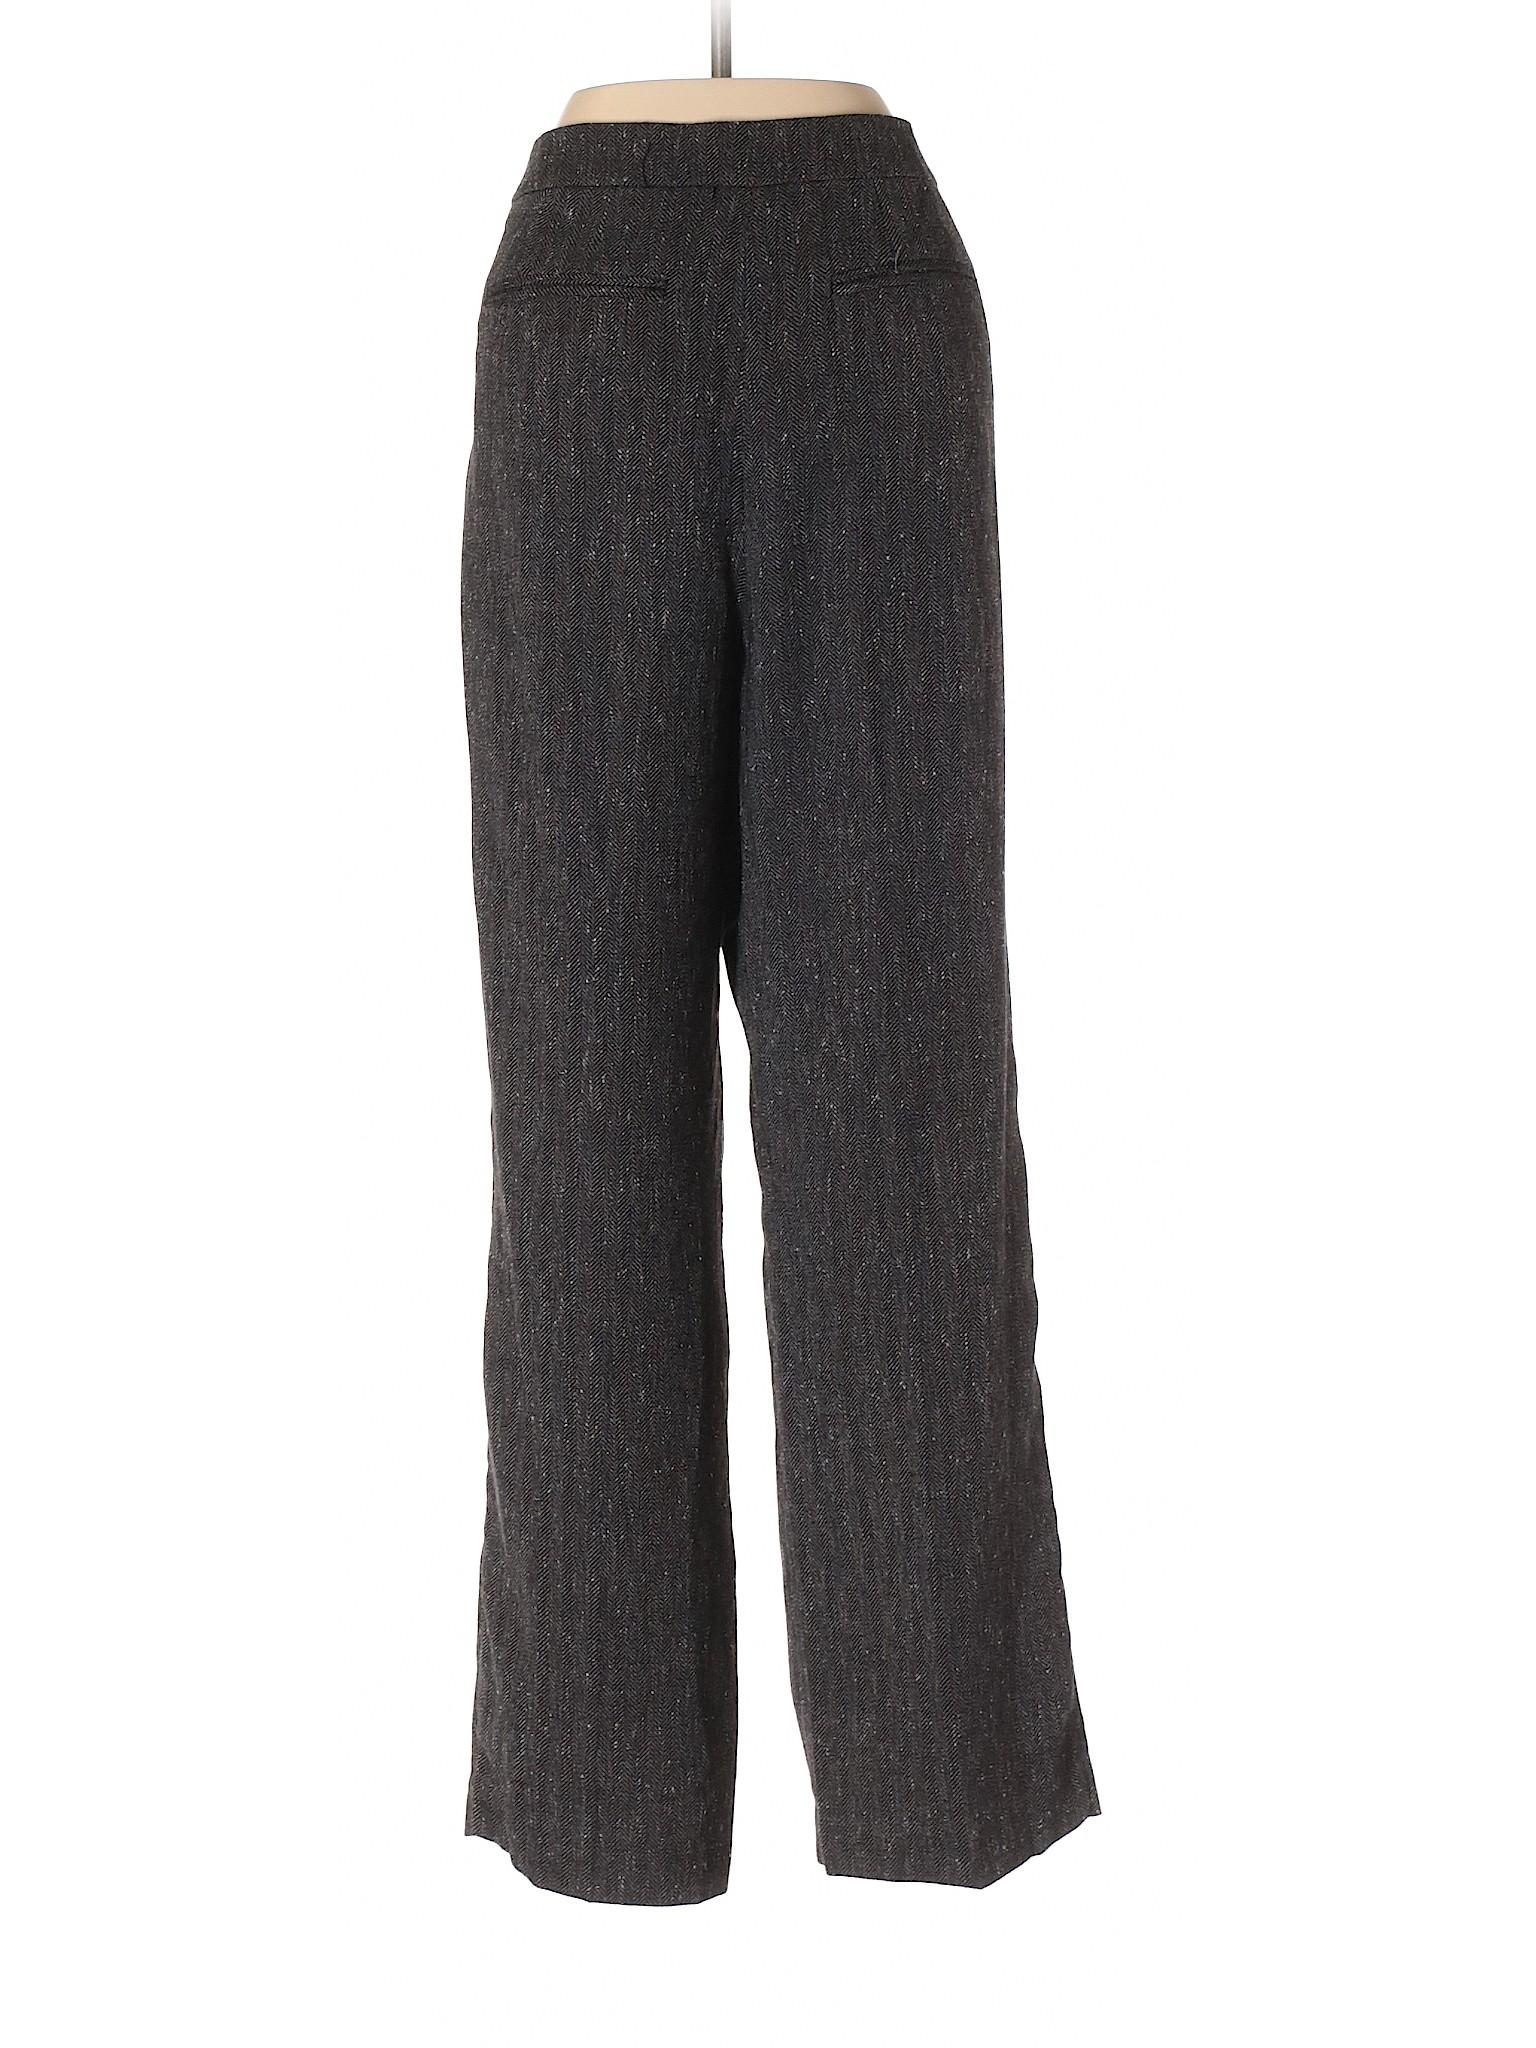 212 Collection Pants winter Leisure Dress x5qBXUf